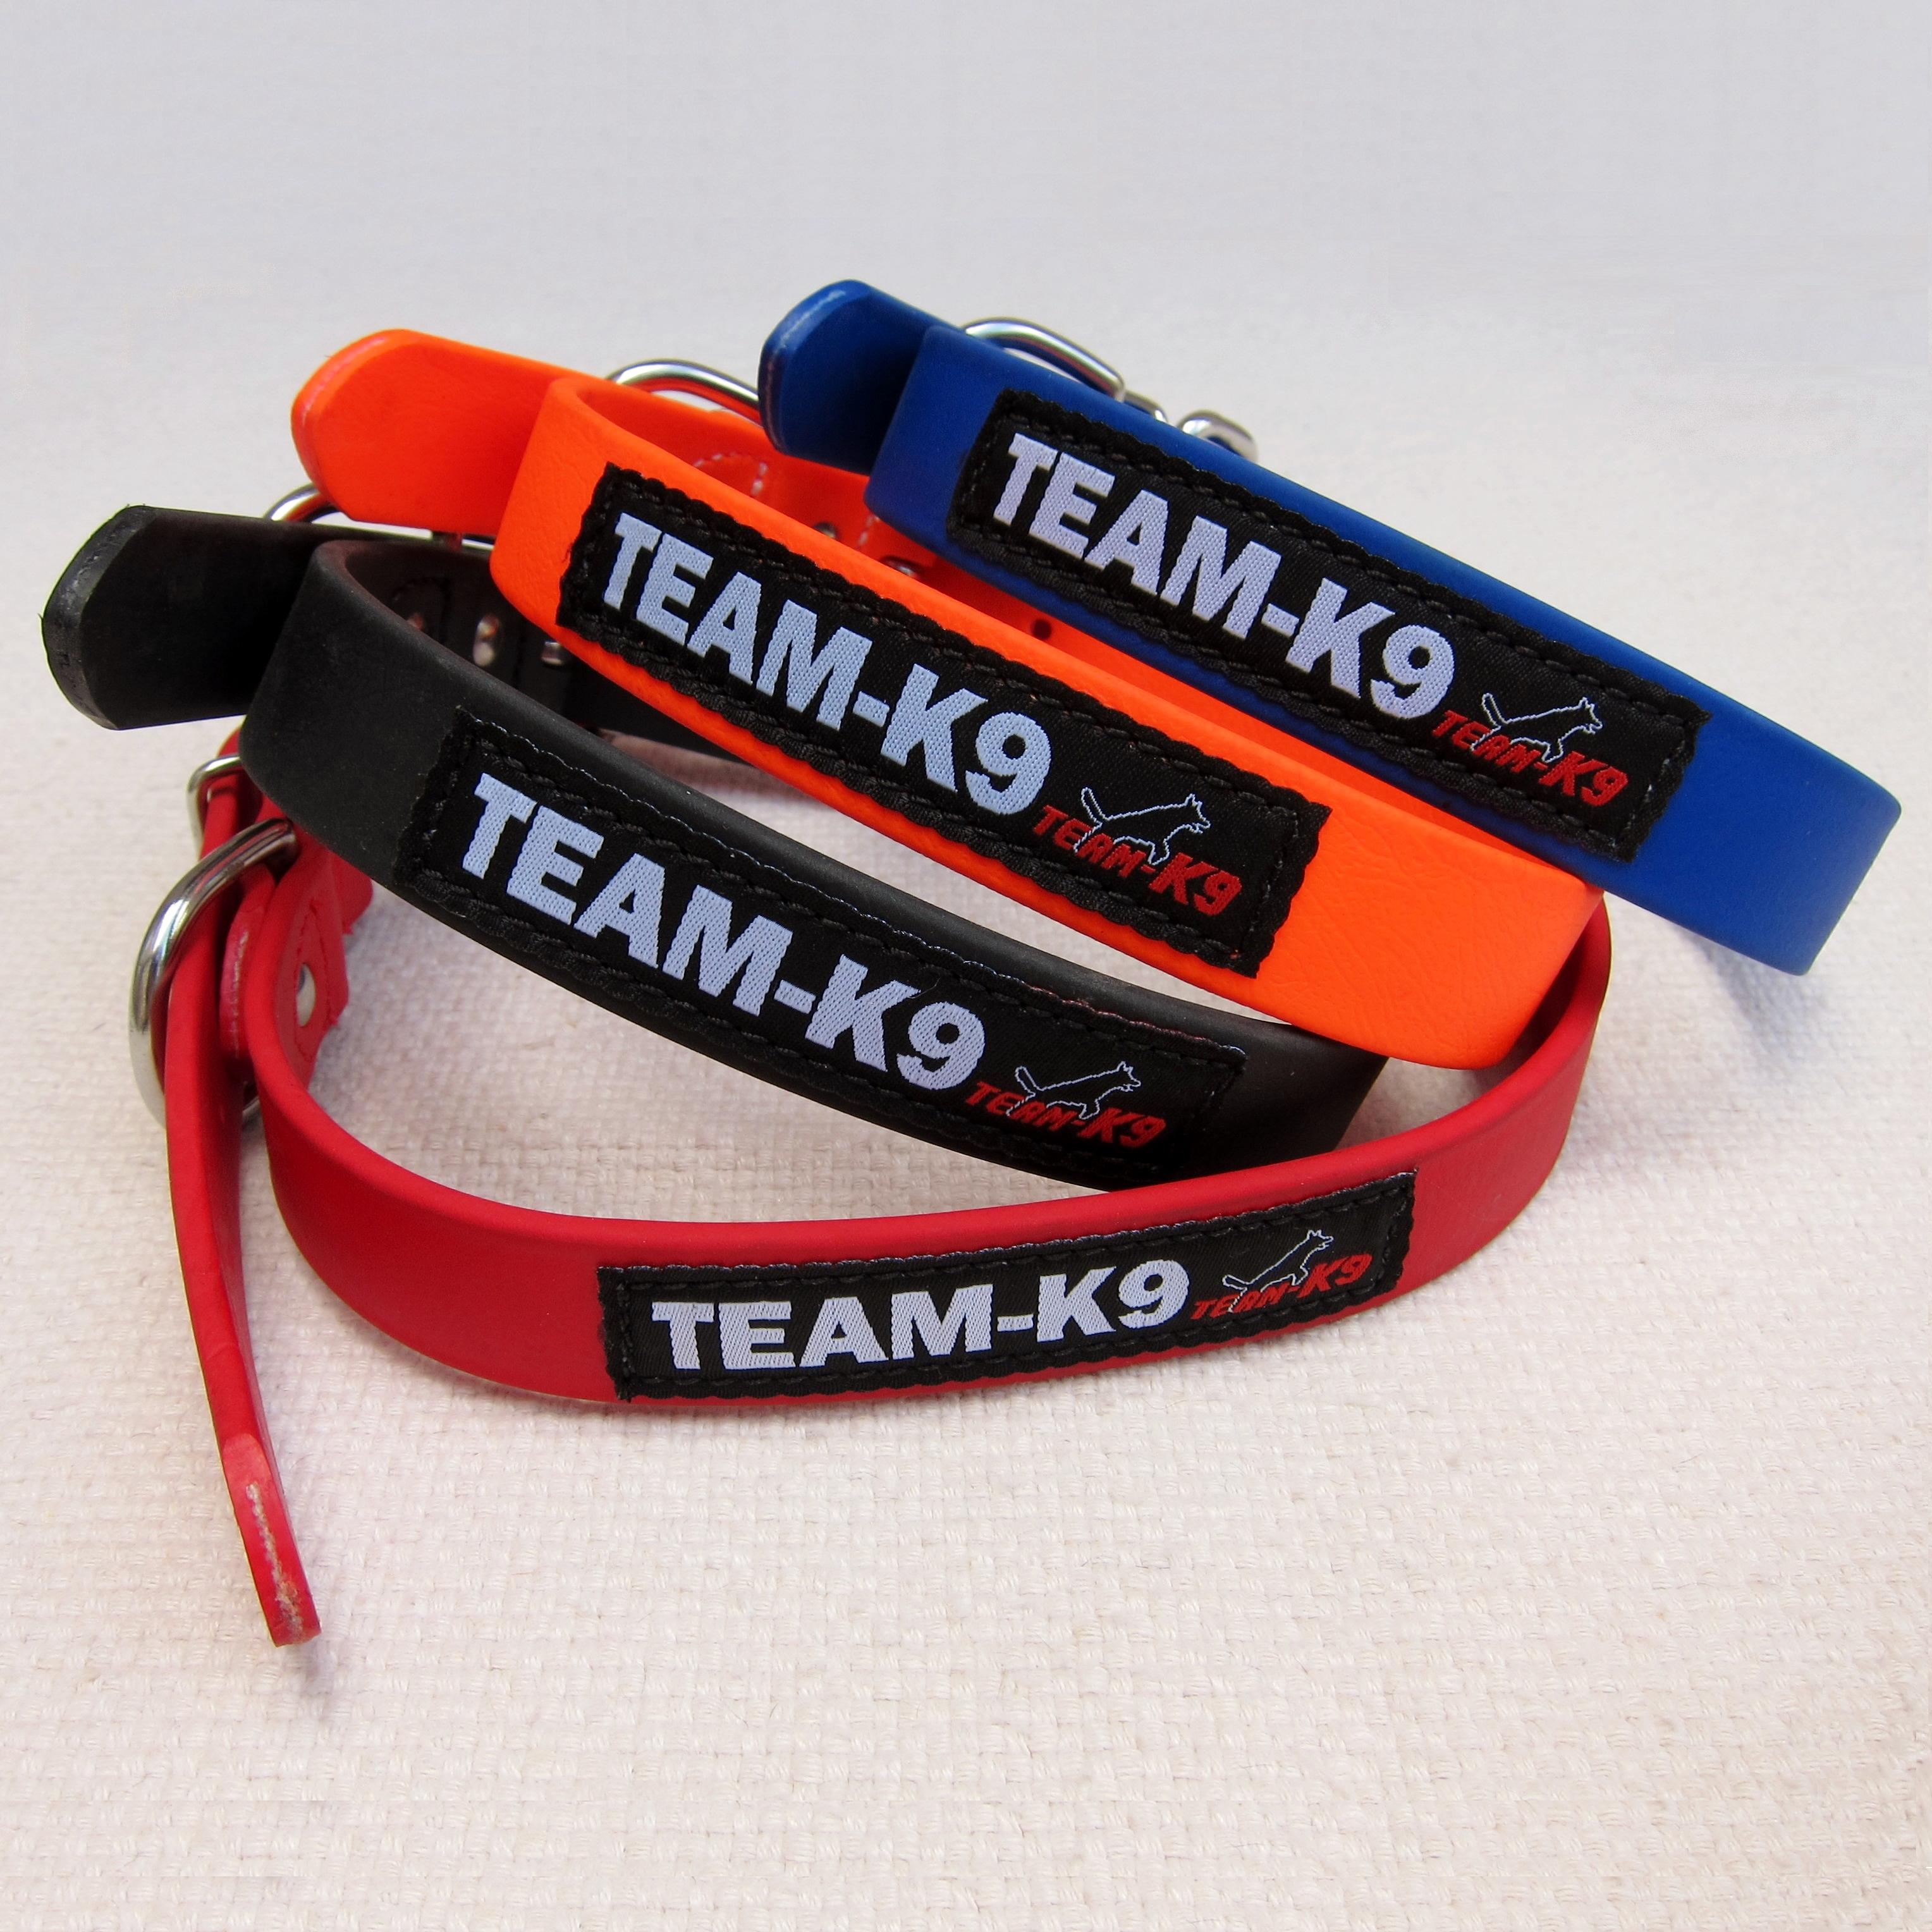 dog collar, biothane collar, dog collars, biothane dog collars, dog leash, protection training leash, mississauga, ontario, oakville, brampton, biothane